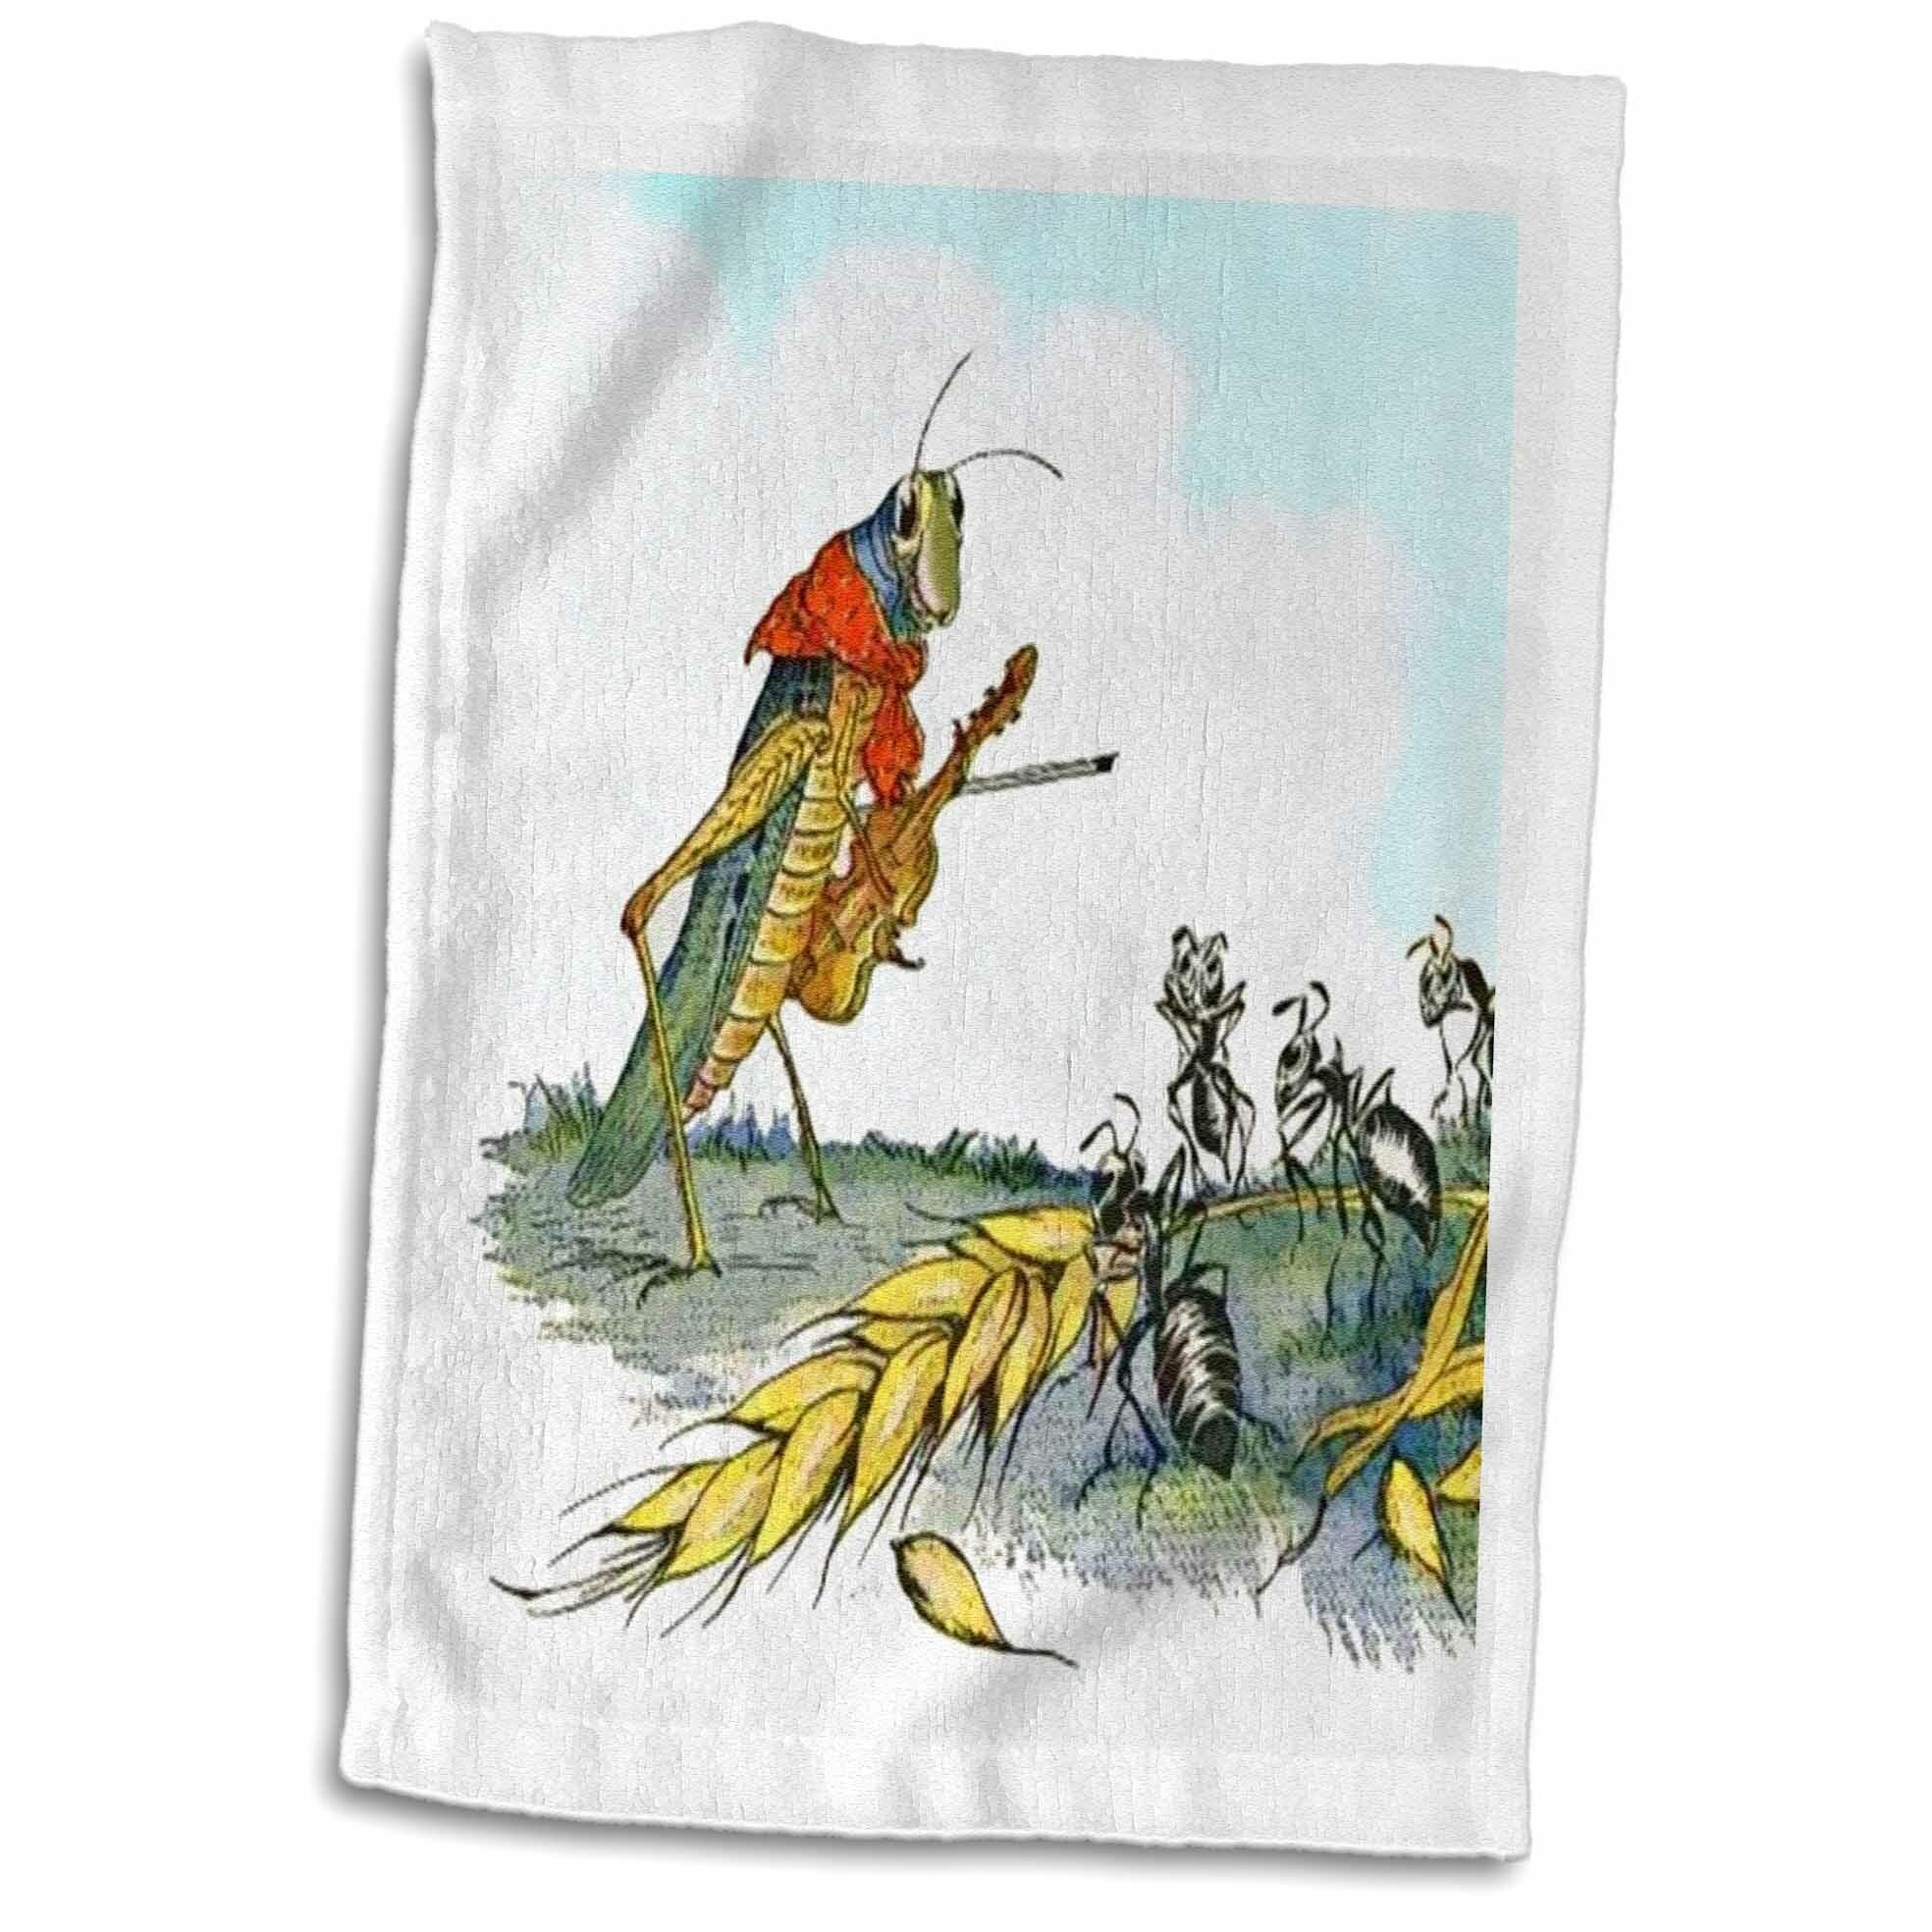 Symple Stuff Malakai Ant And The Grasshopper Hand Towel Wayfair